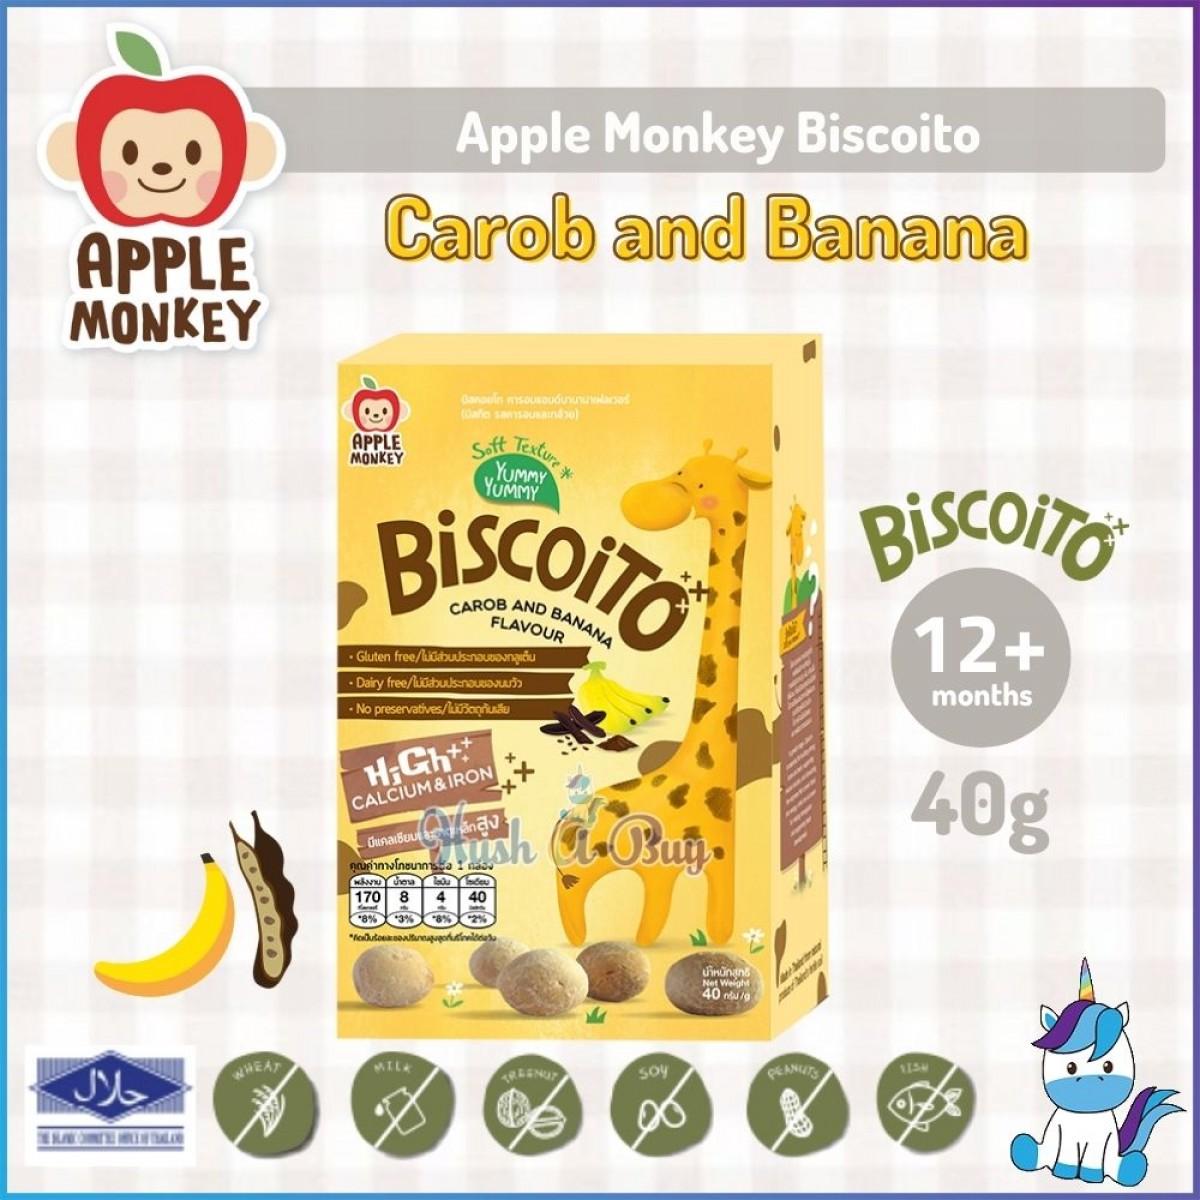 【HALAL】Apple Monkey Biscoito Carob Banana / Blueberry Banana40g